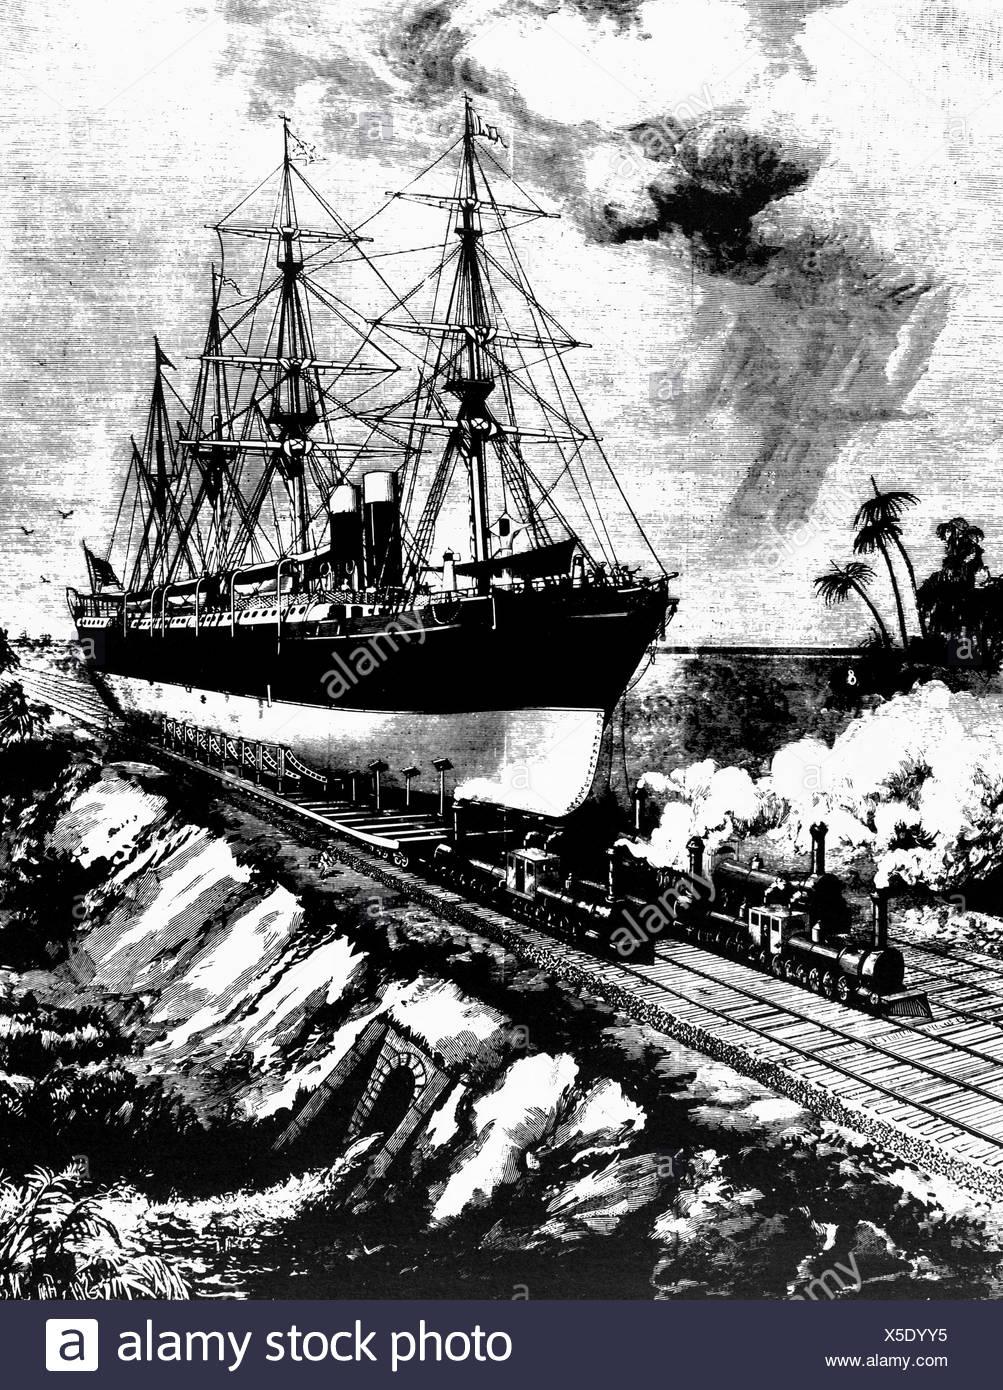 proposed inter - oceanic railway in Panama, 1884 - Stock Image